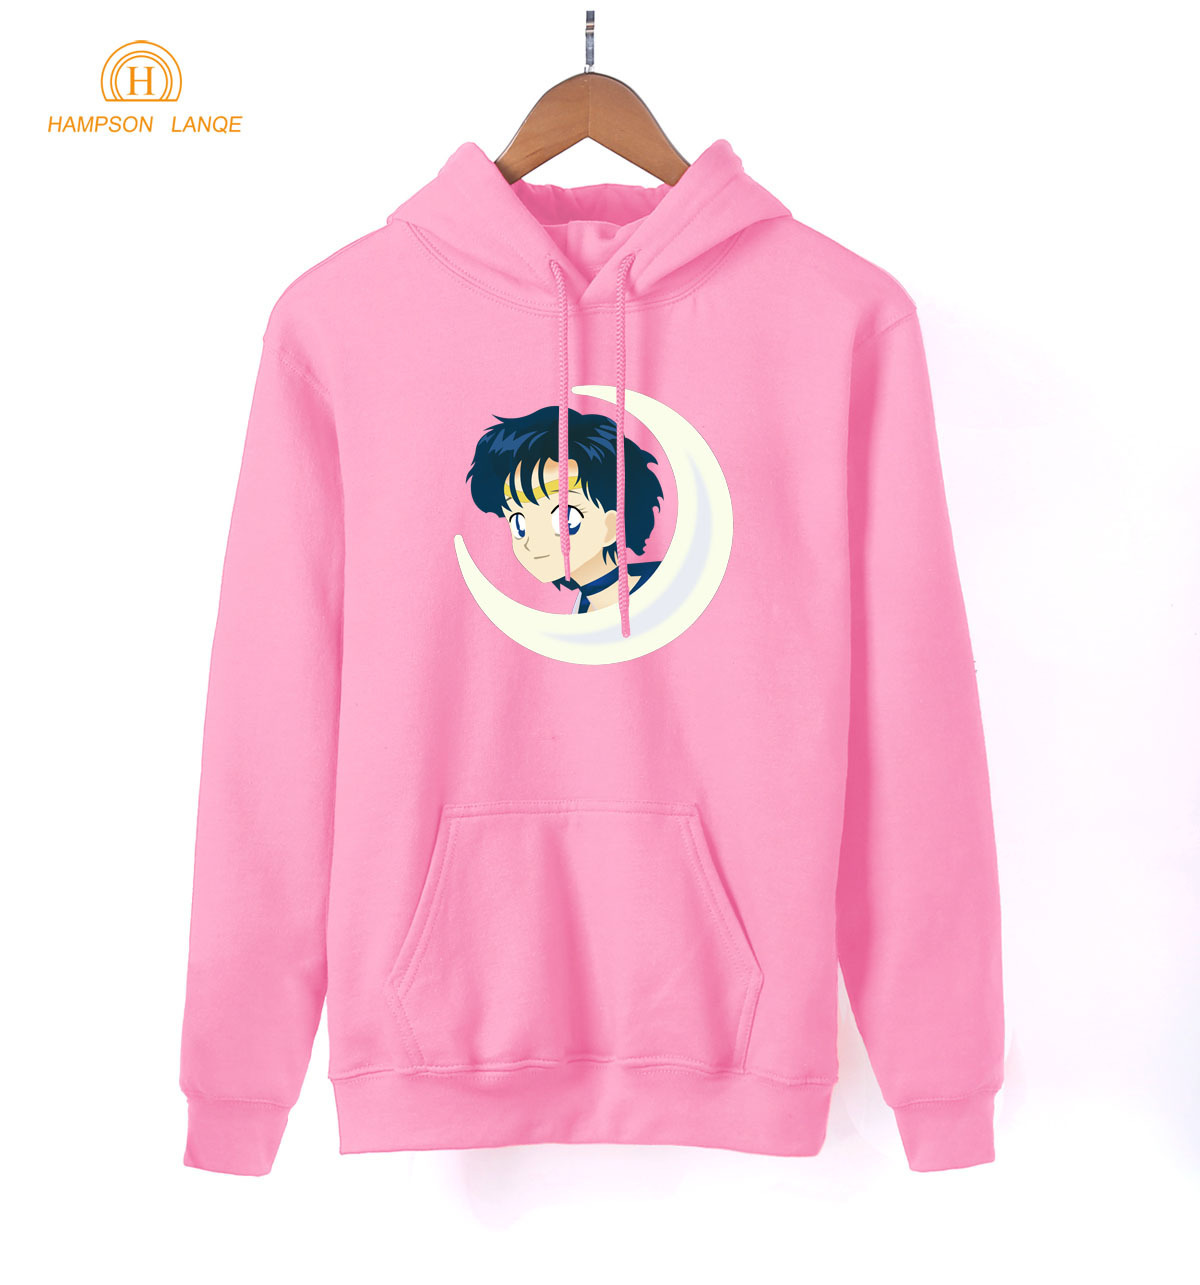 Japan Anime Kawaii Sailor Moon Pink Hoodies For Girls 2019 Hot Spring Autumn Cute Sweatshirts For Lady Women